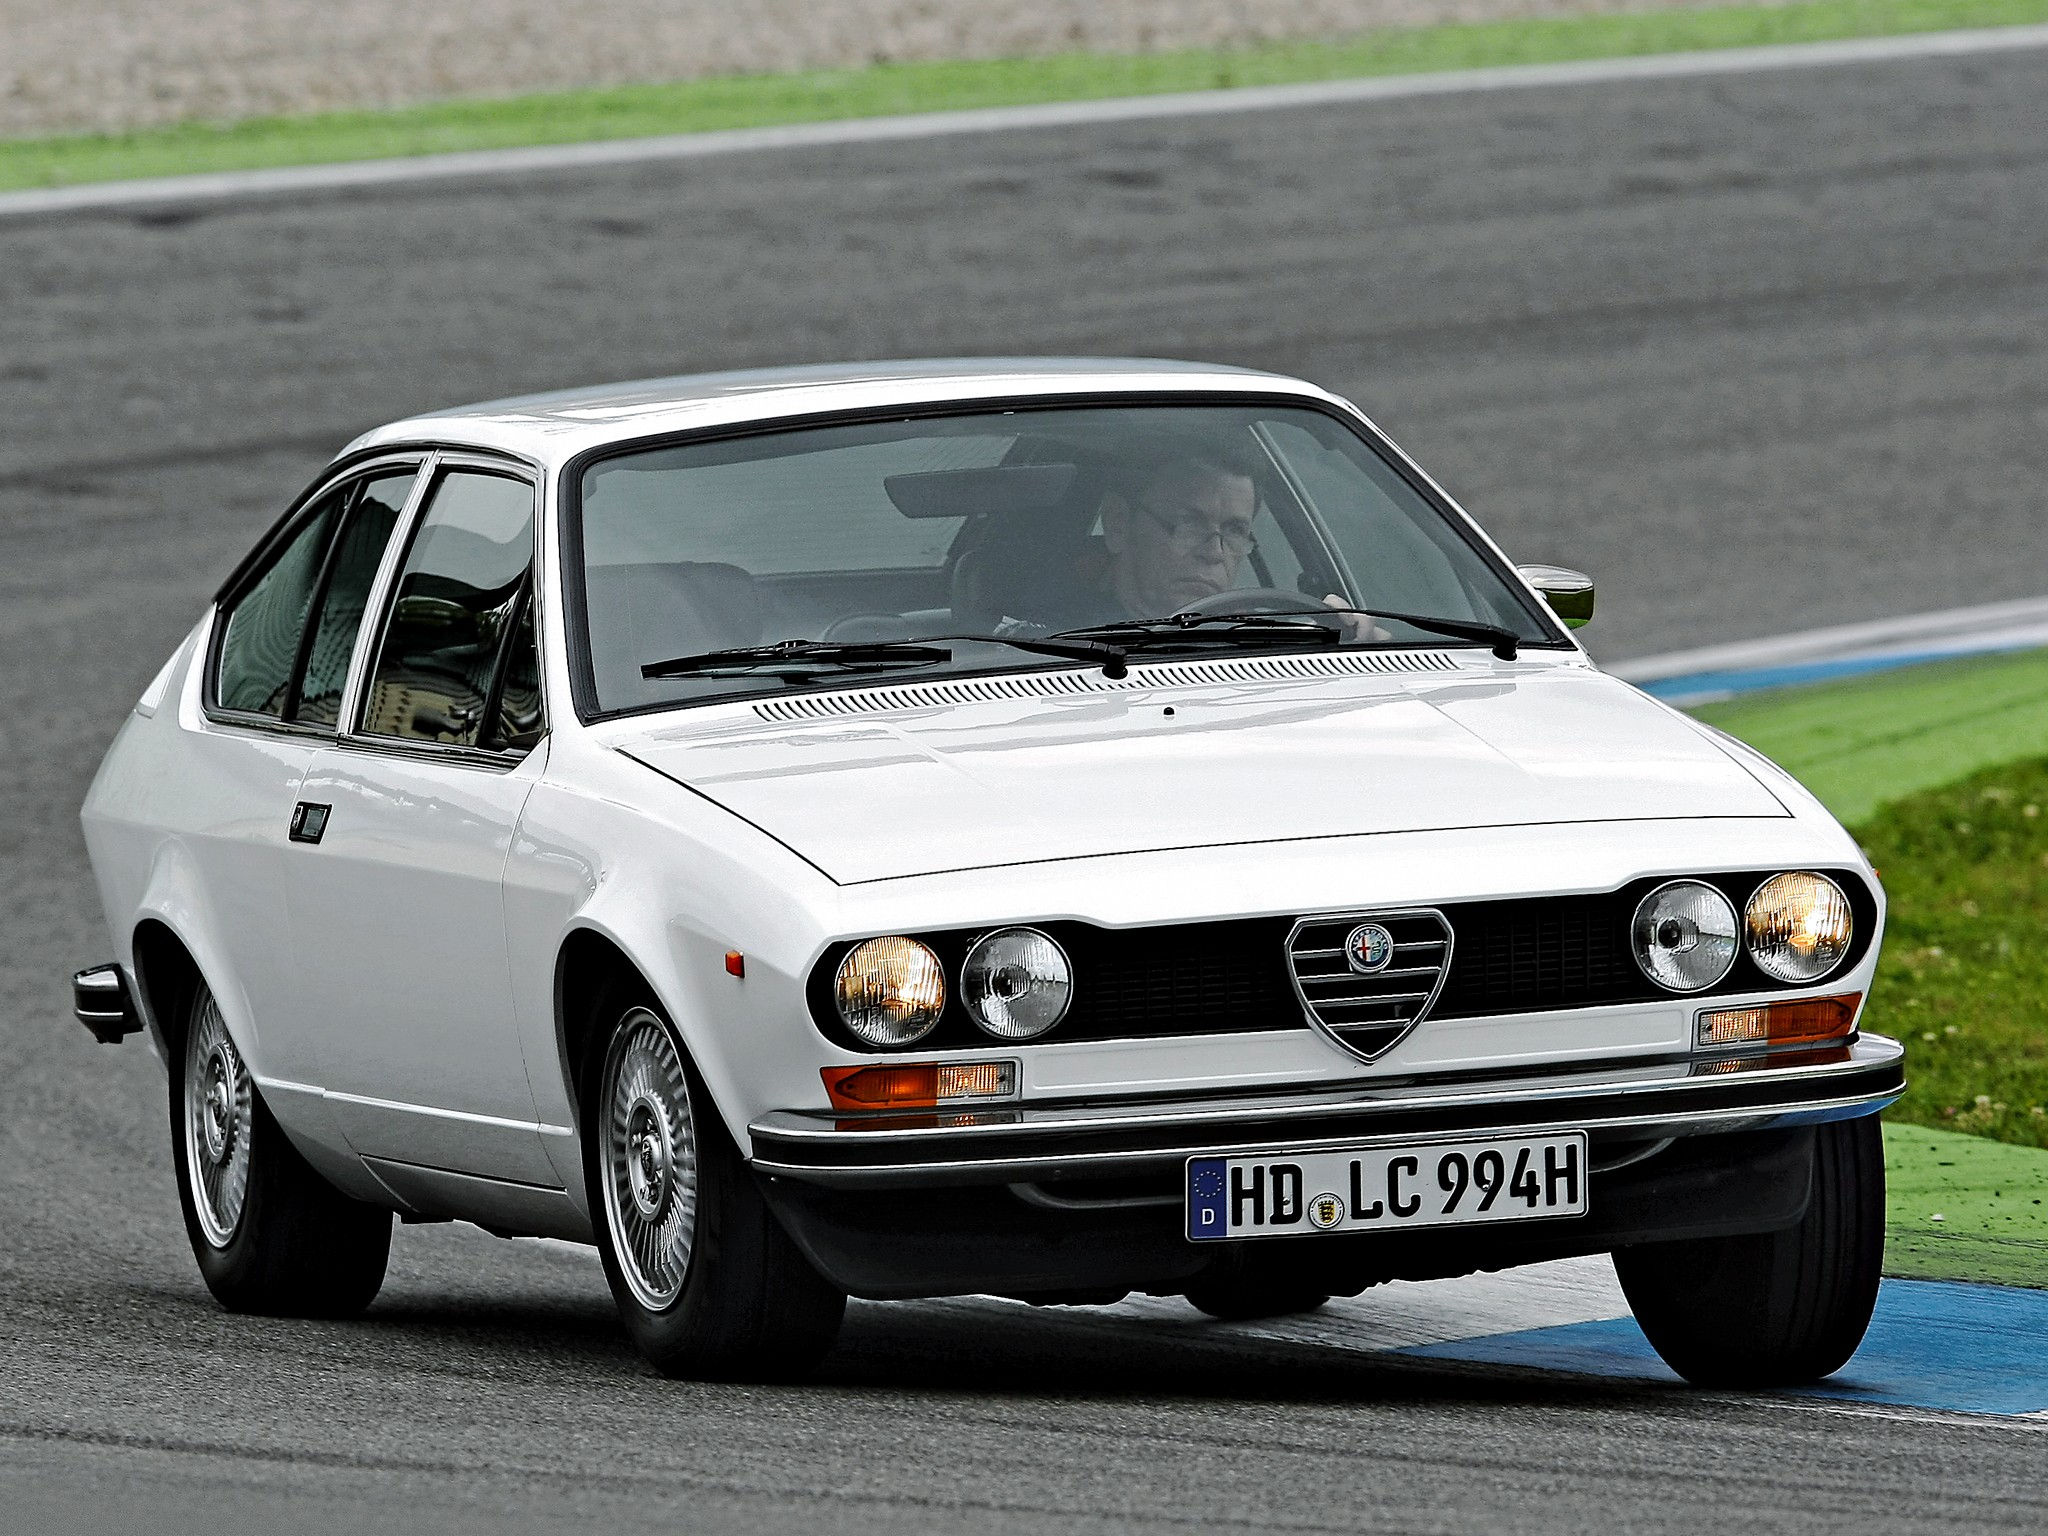 ALFA ROMEO Alfetta GT specs - 1974, 1975, 1976, 1977, 1978, 1979, 1980 - autoevolution